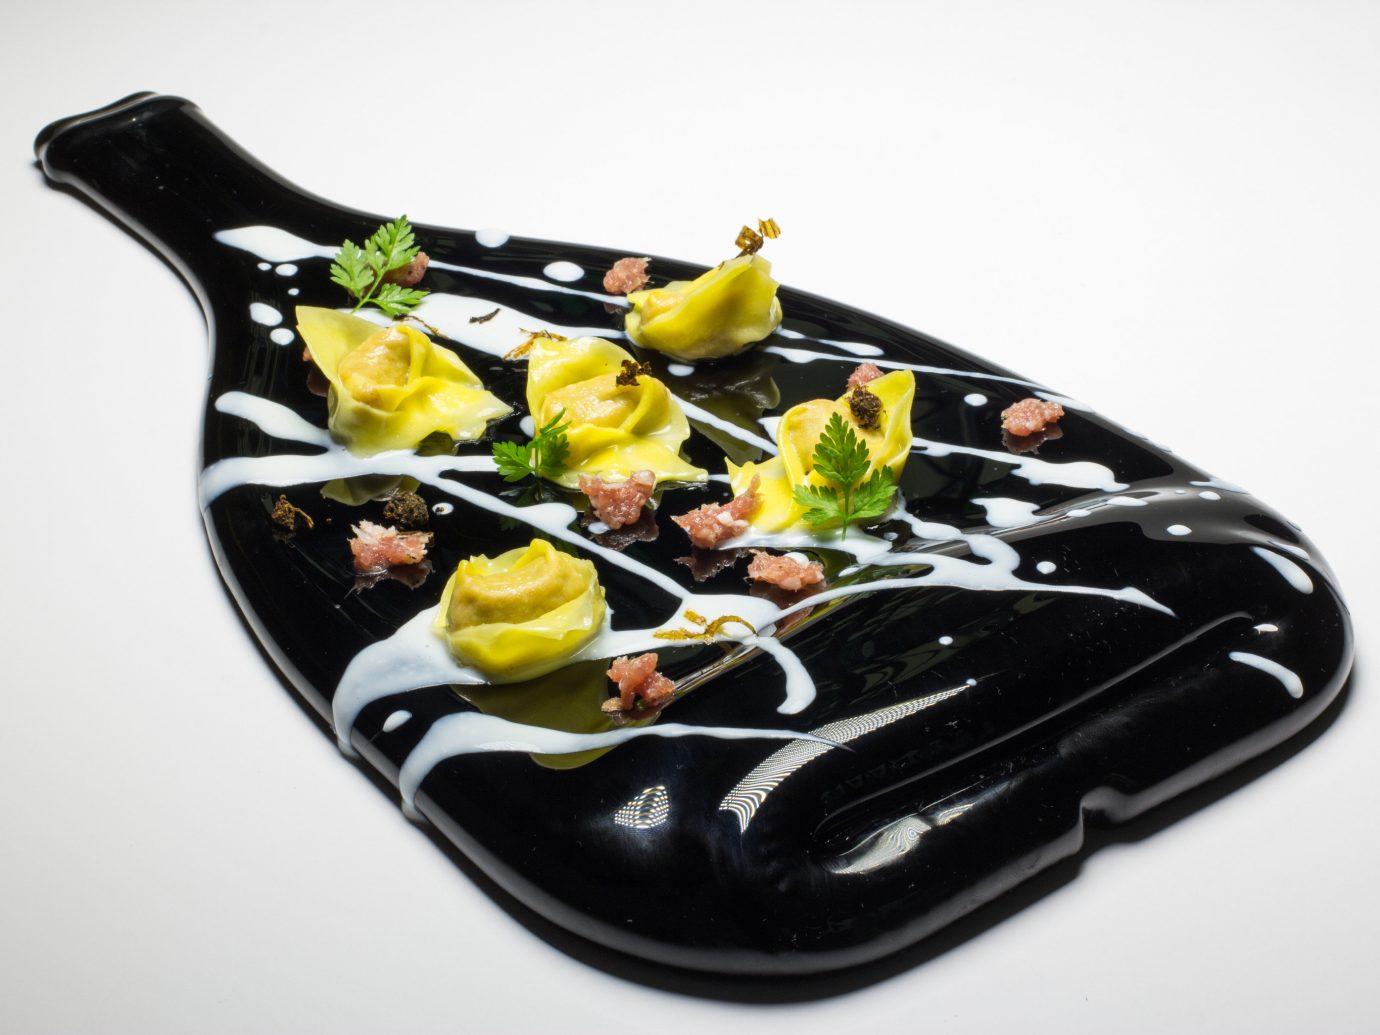 Food + Drink dish food black meal cuisine produce mussel wok